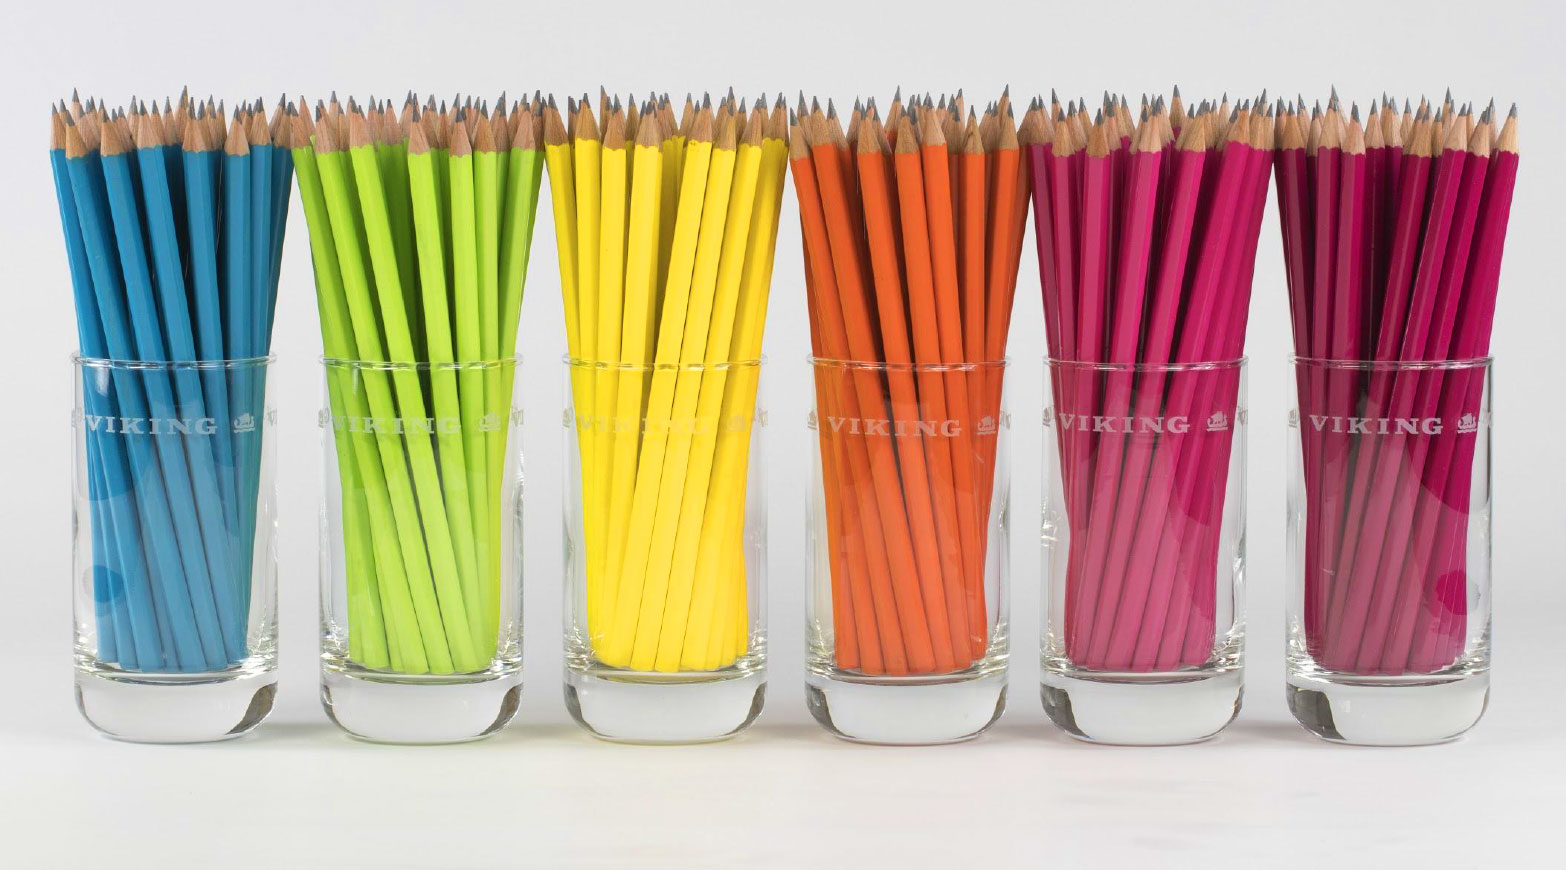 viking_pencils_mood4.jpg